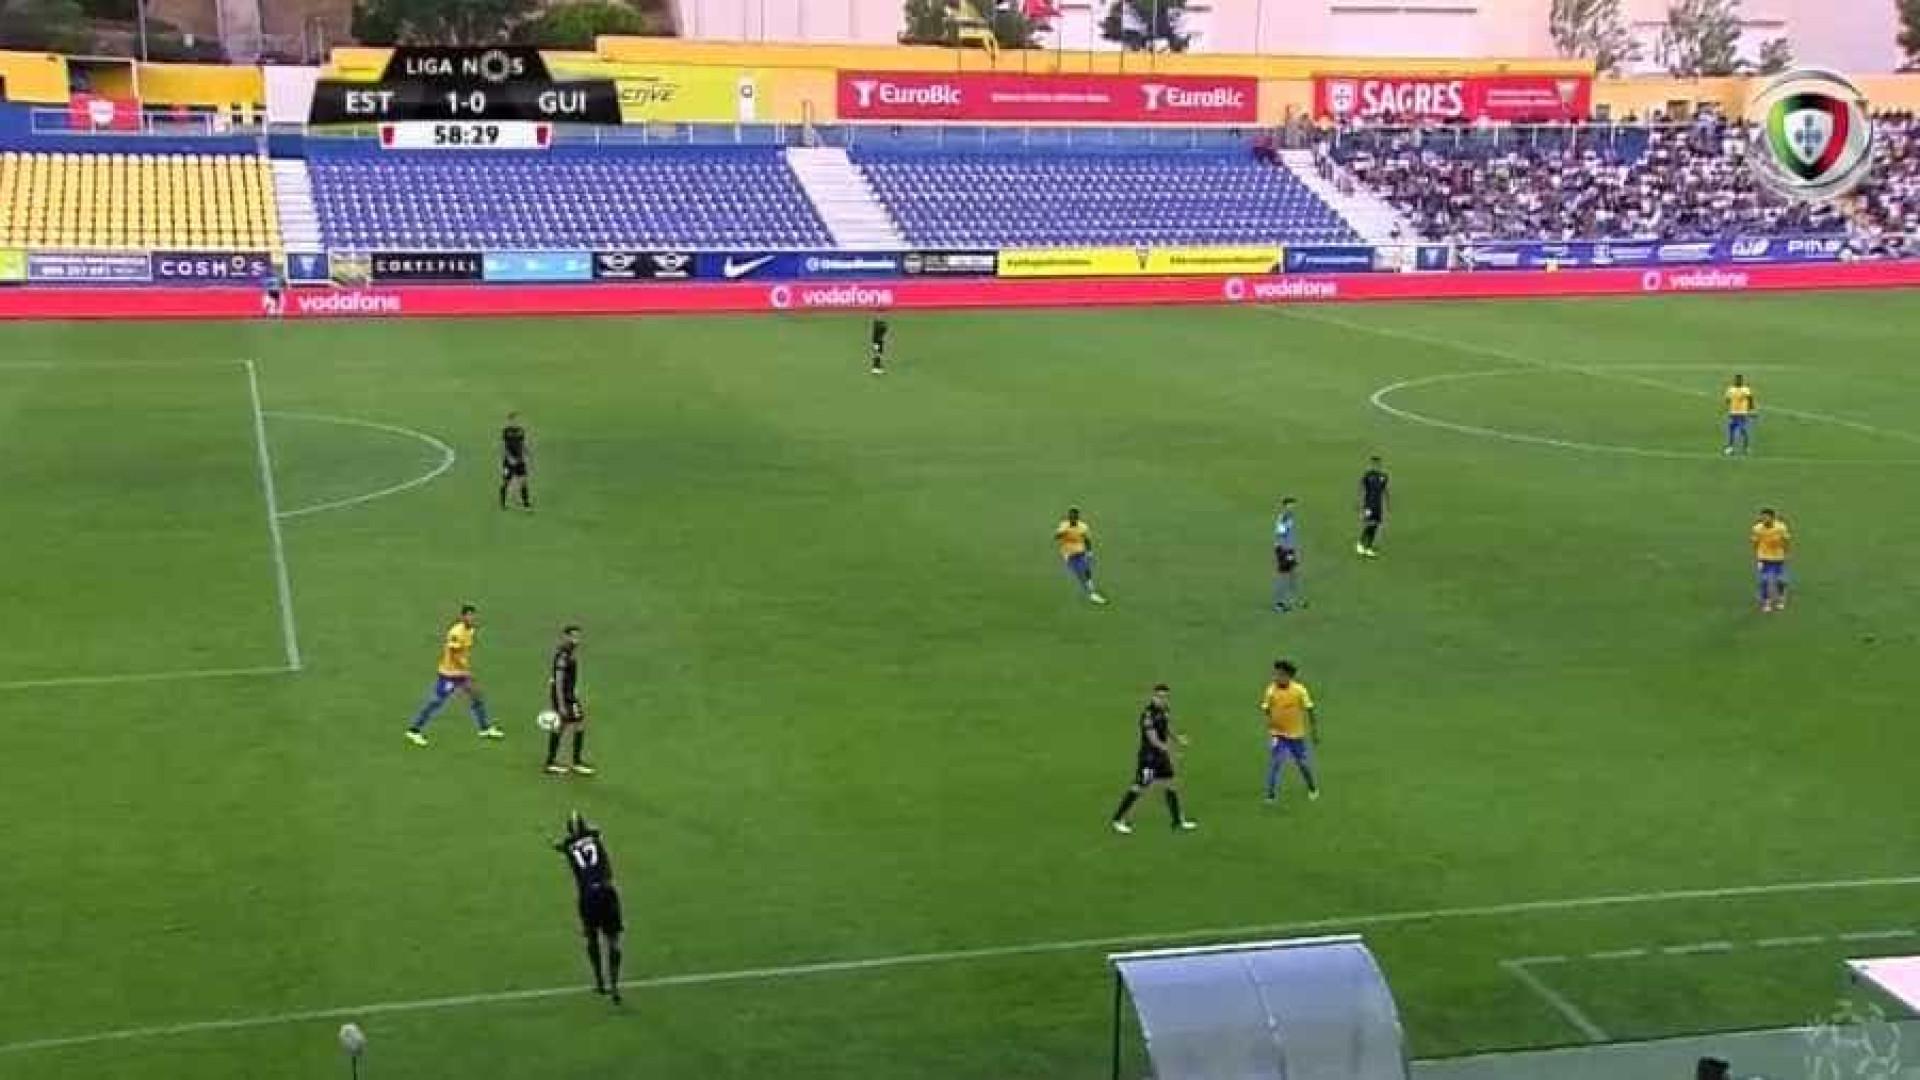 Resultado final: Estoril-Praia 3, Vitória de Guimarães 0